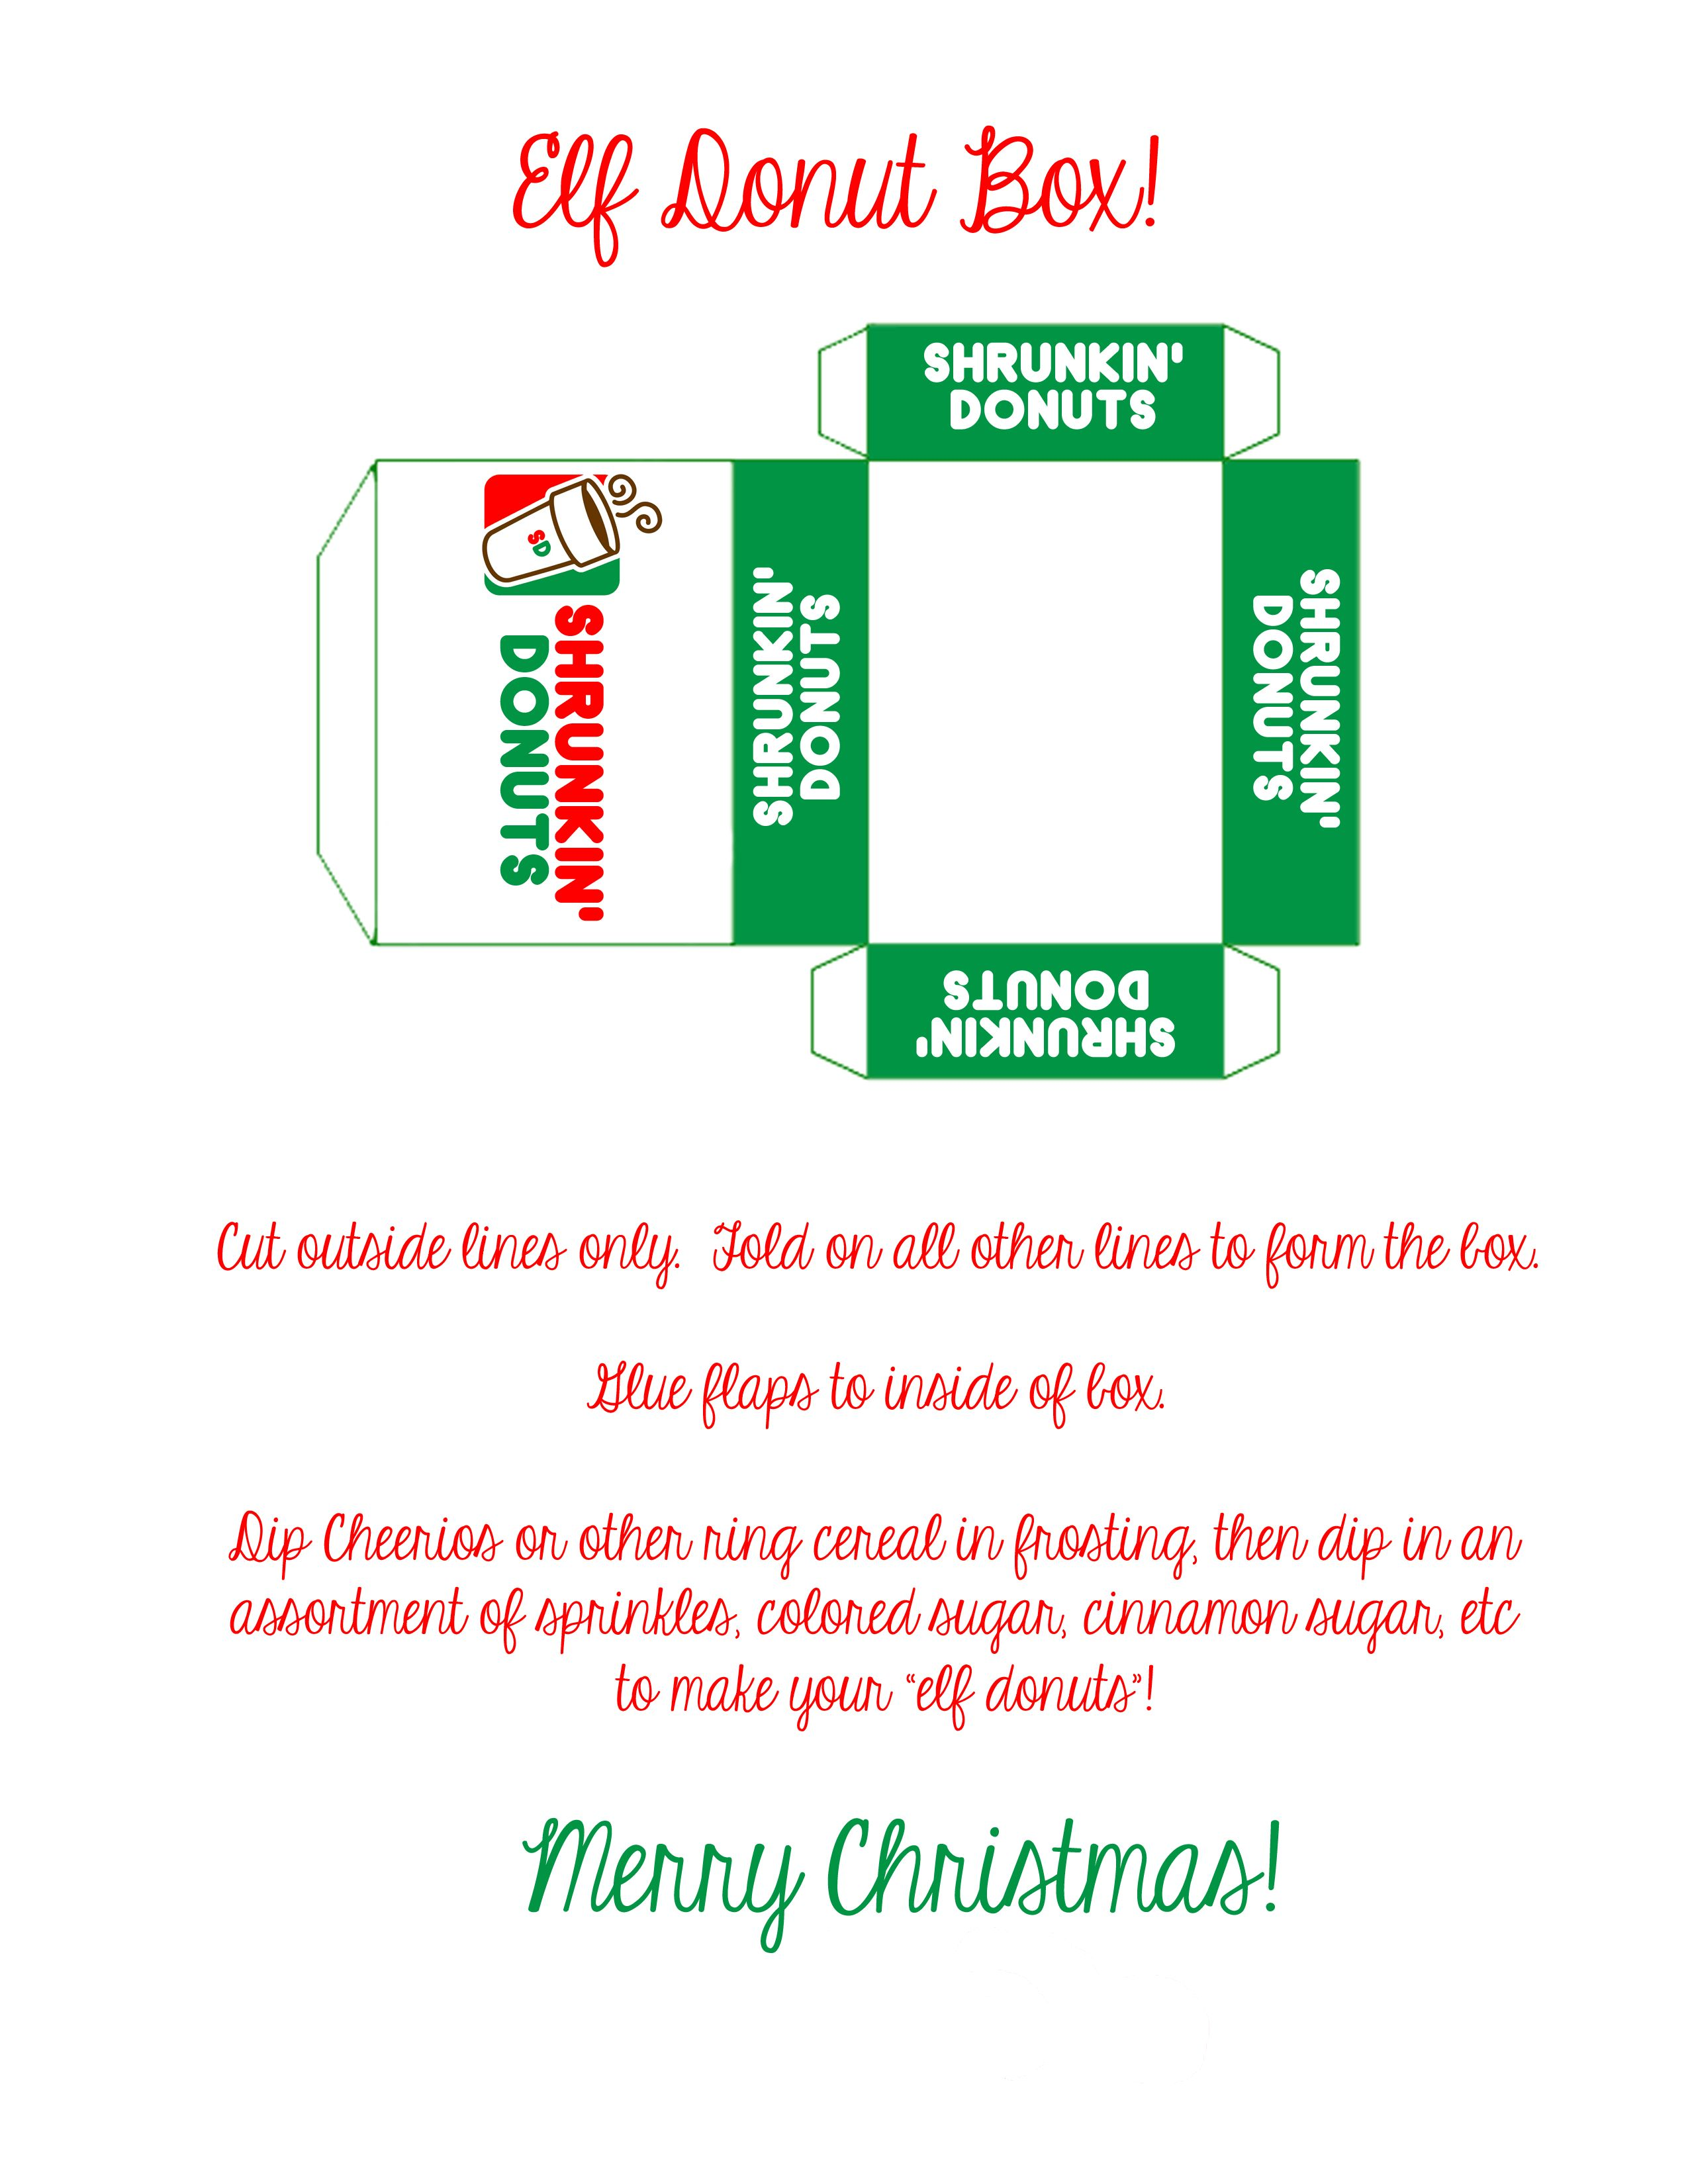 Pin by Carolyn Slade on Christmas   Pinterest